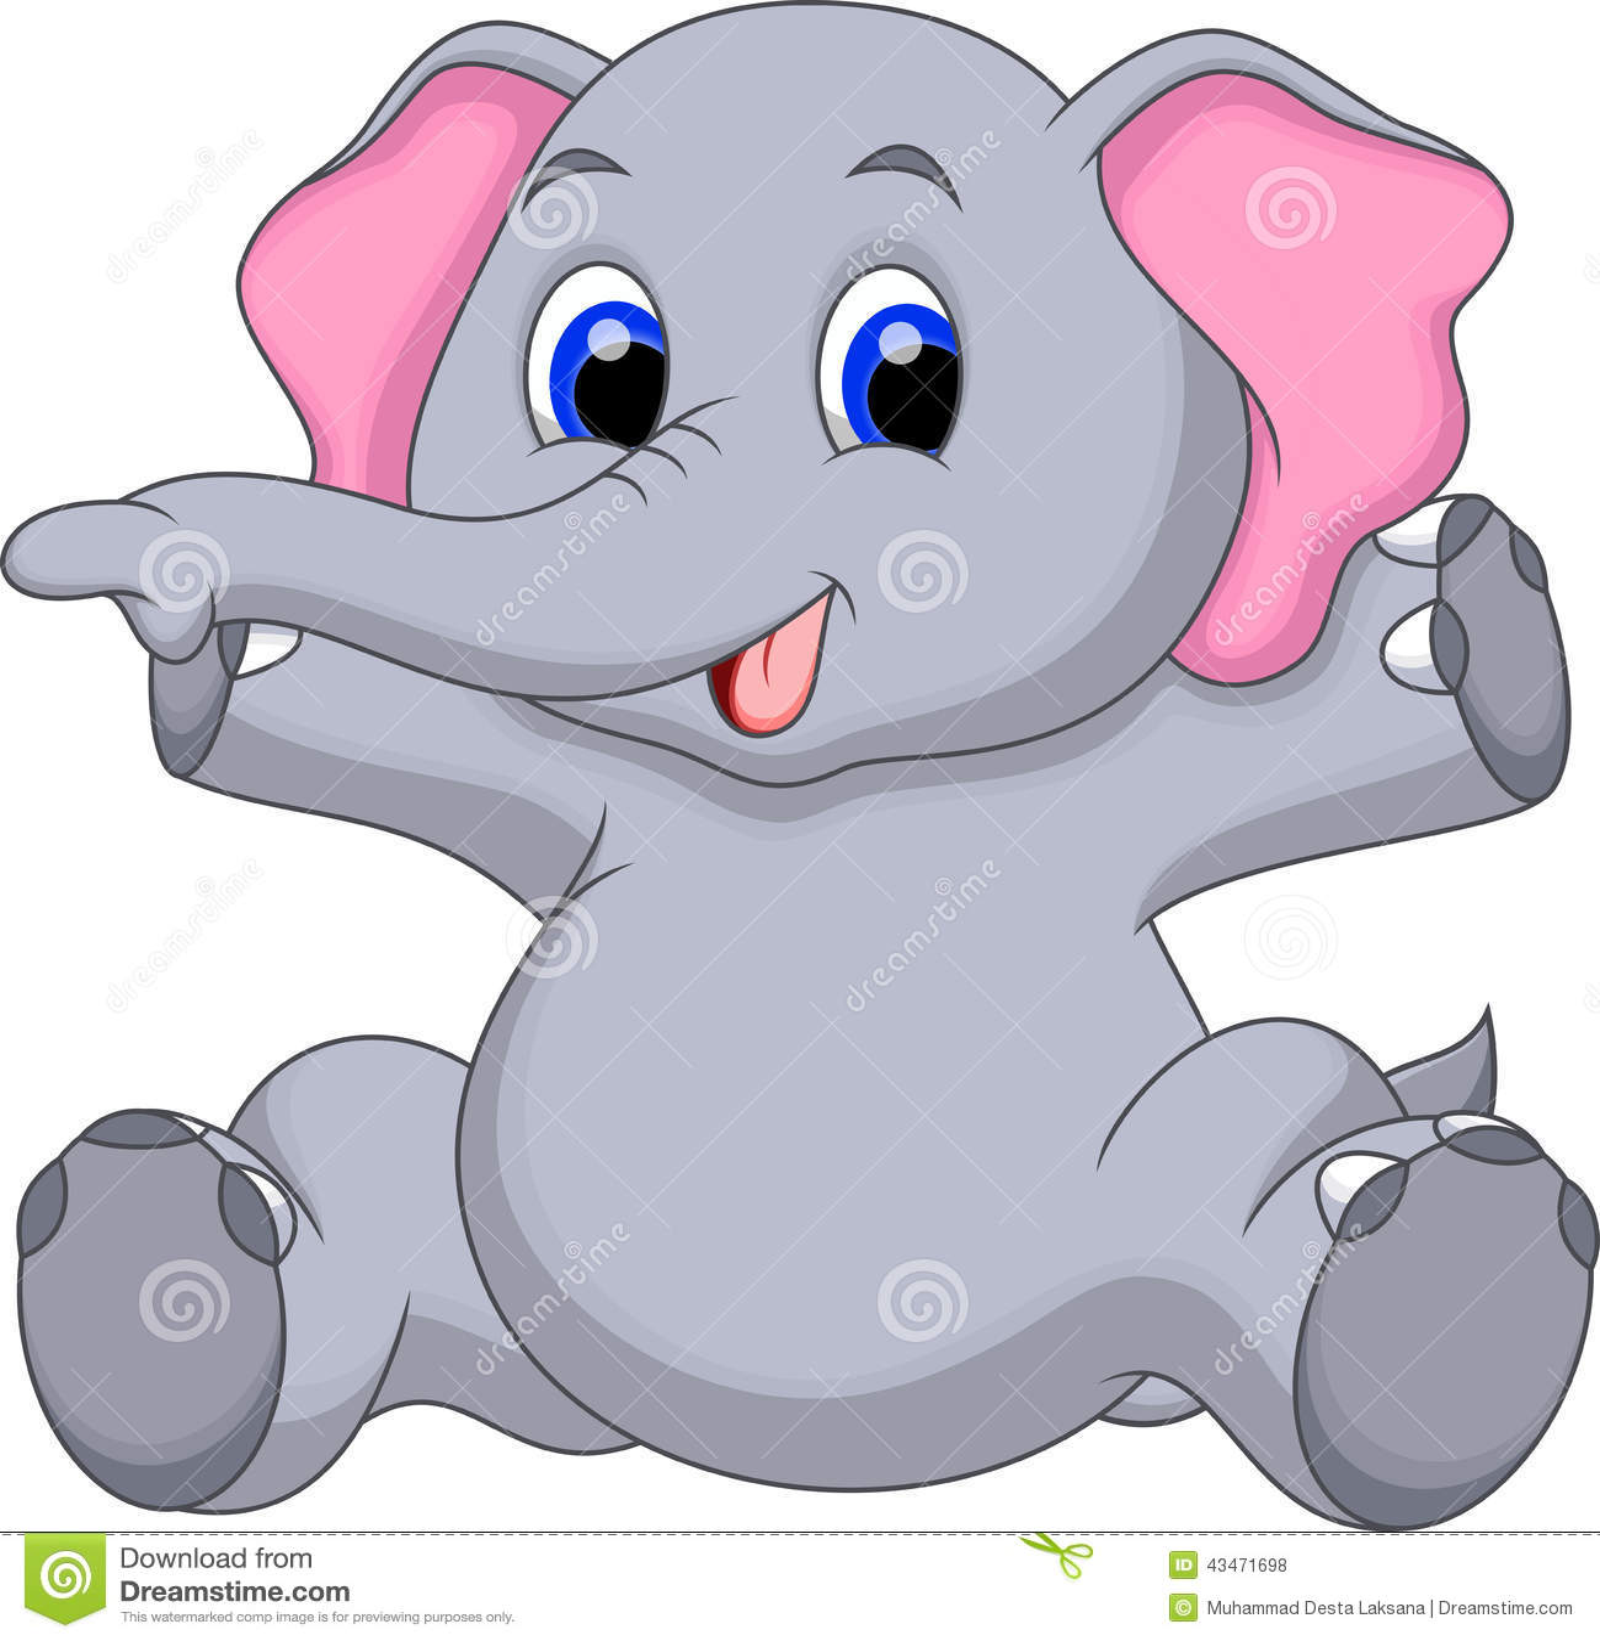 Cute baby elephant cartoon - photo#25